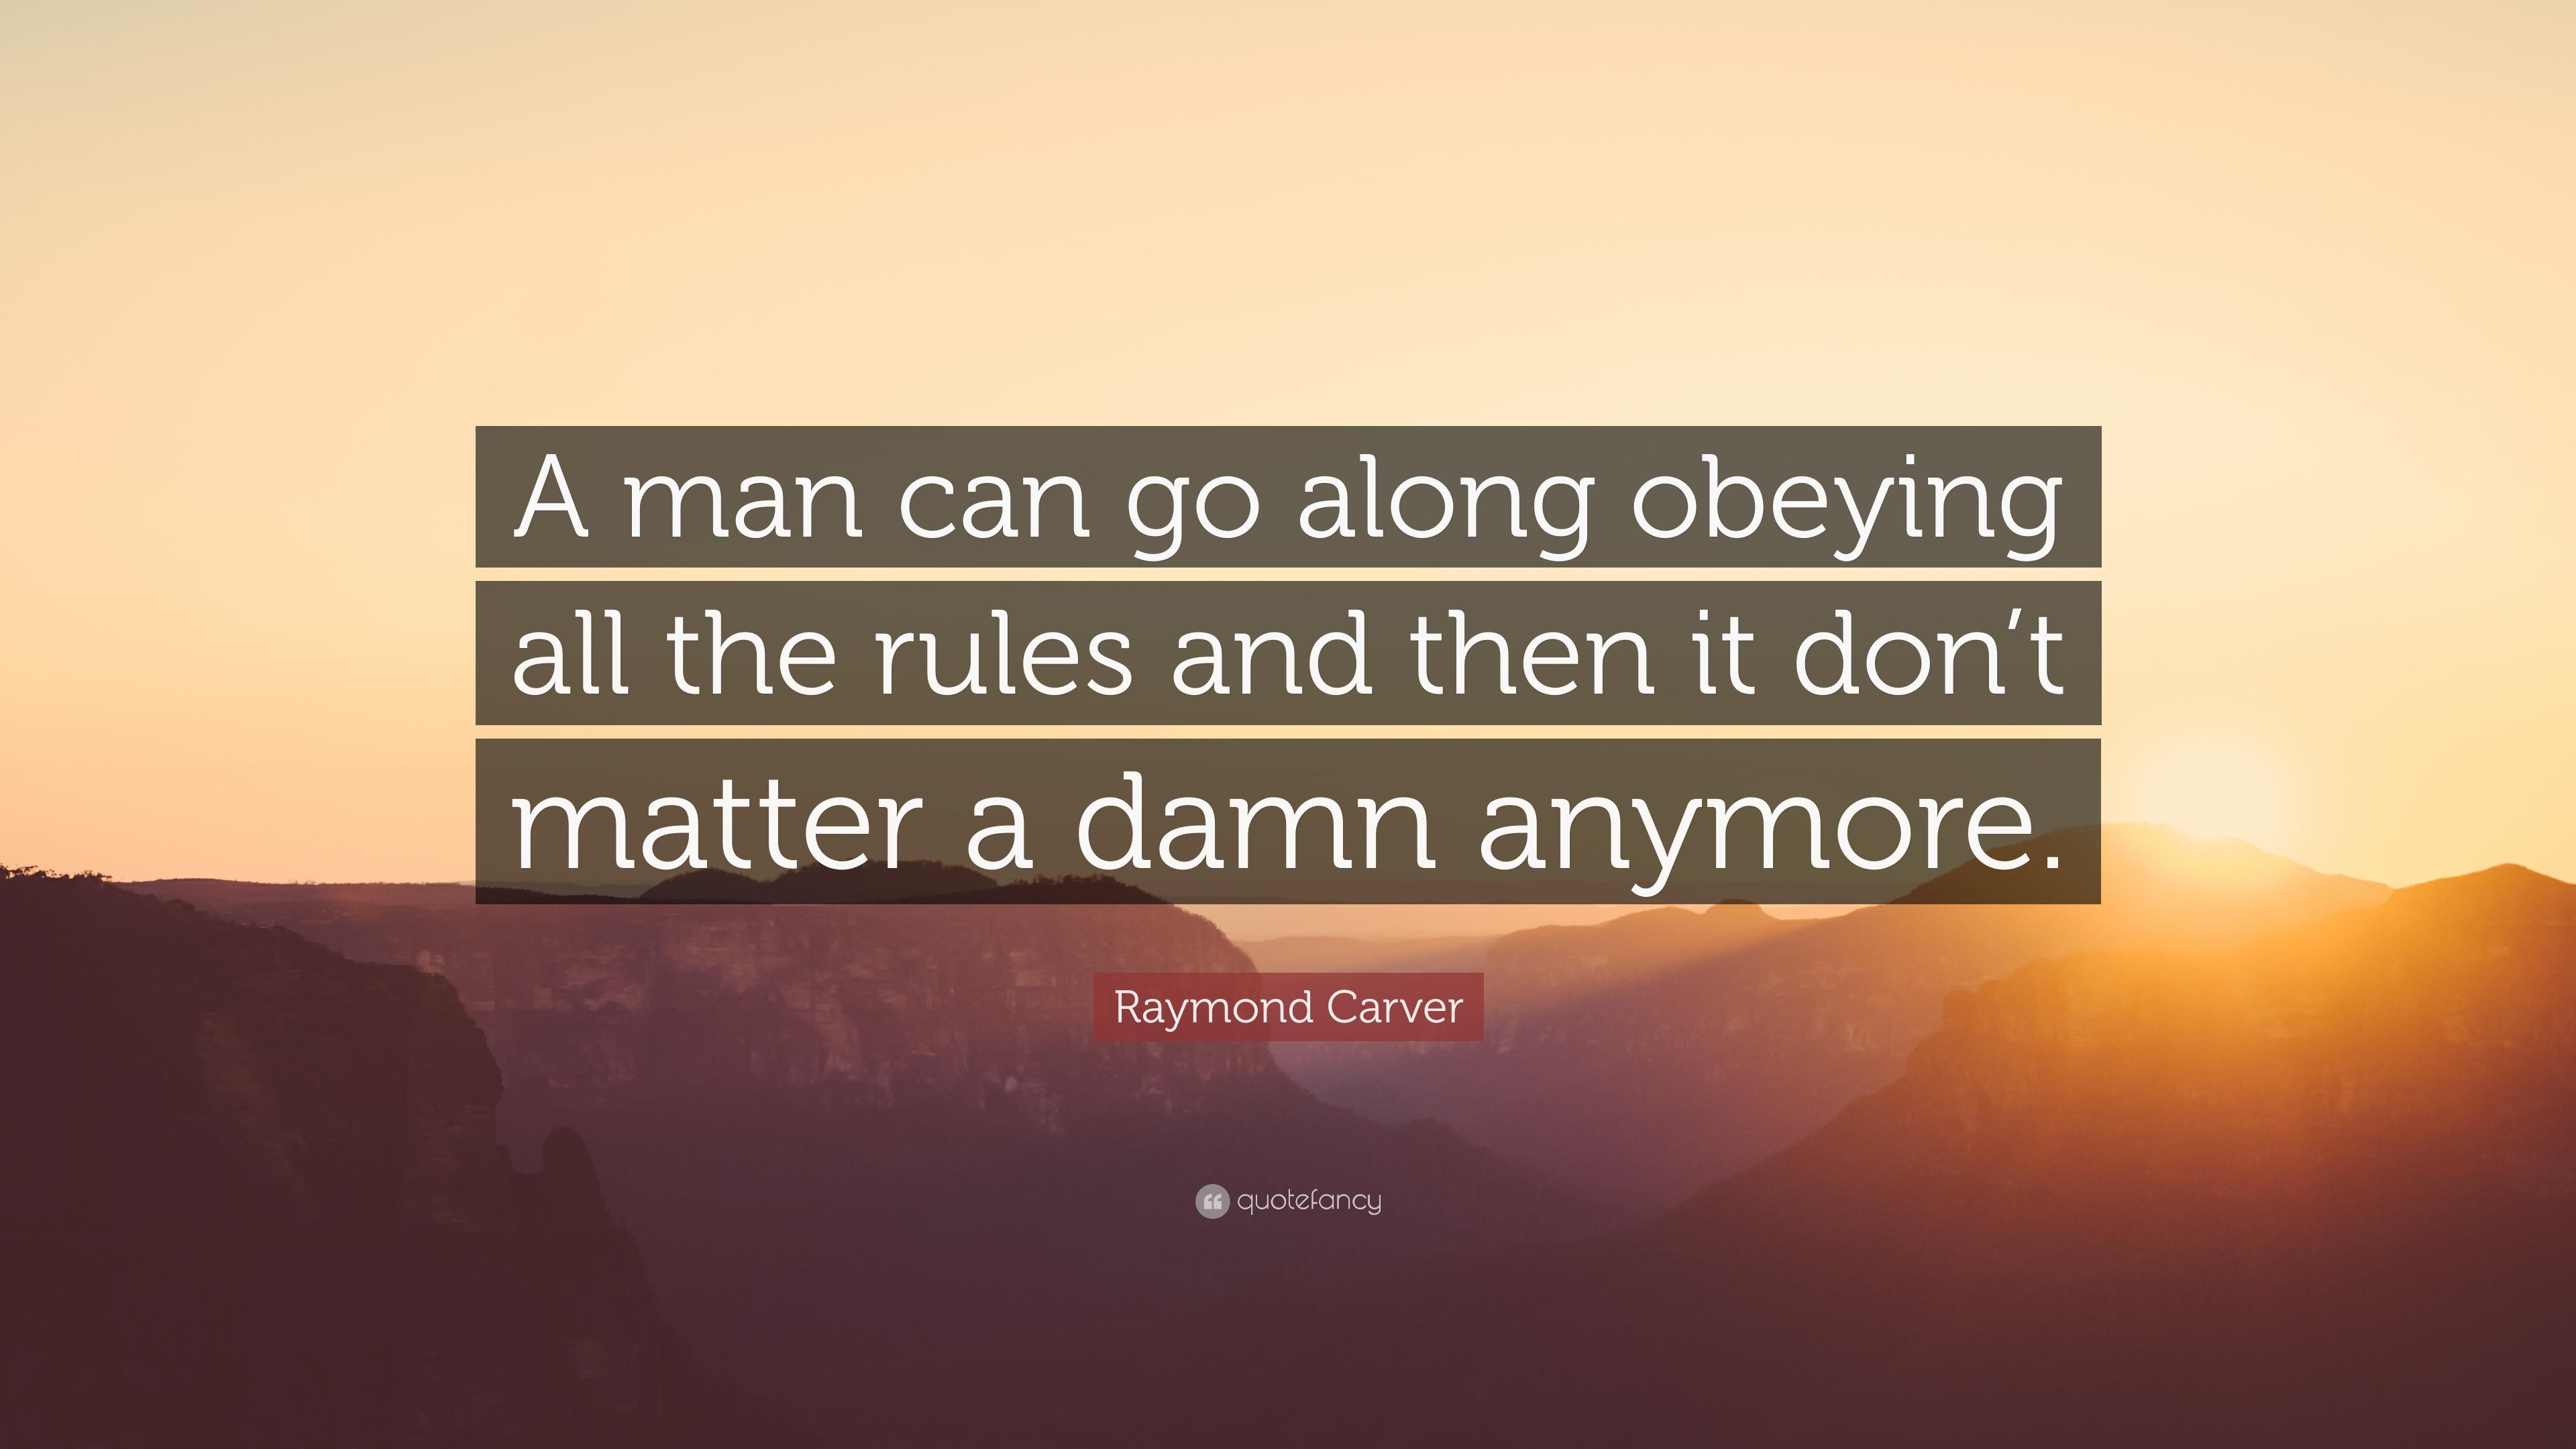 Raymond carver quotes